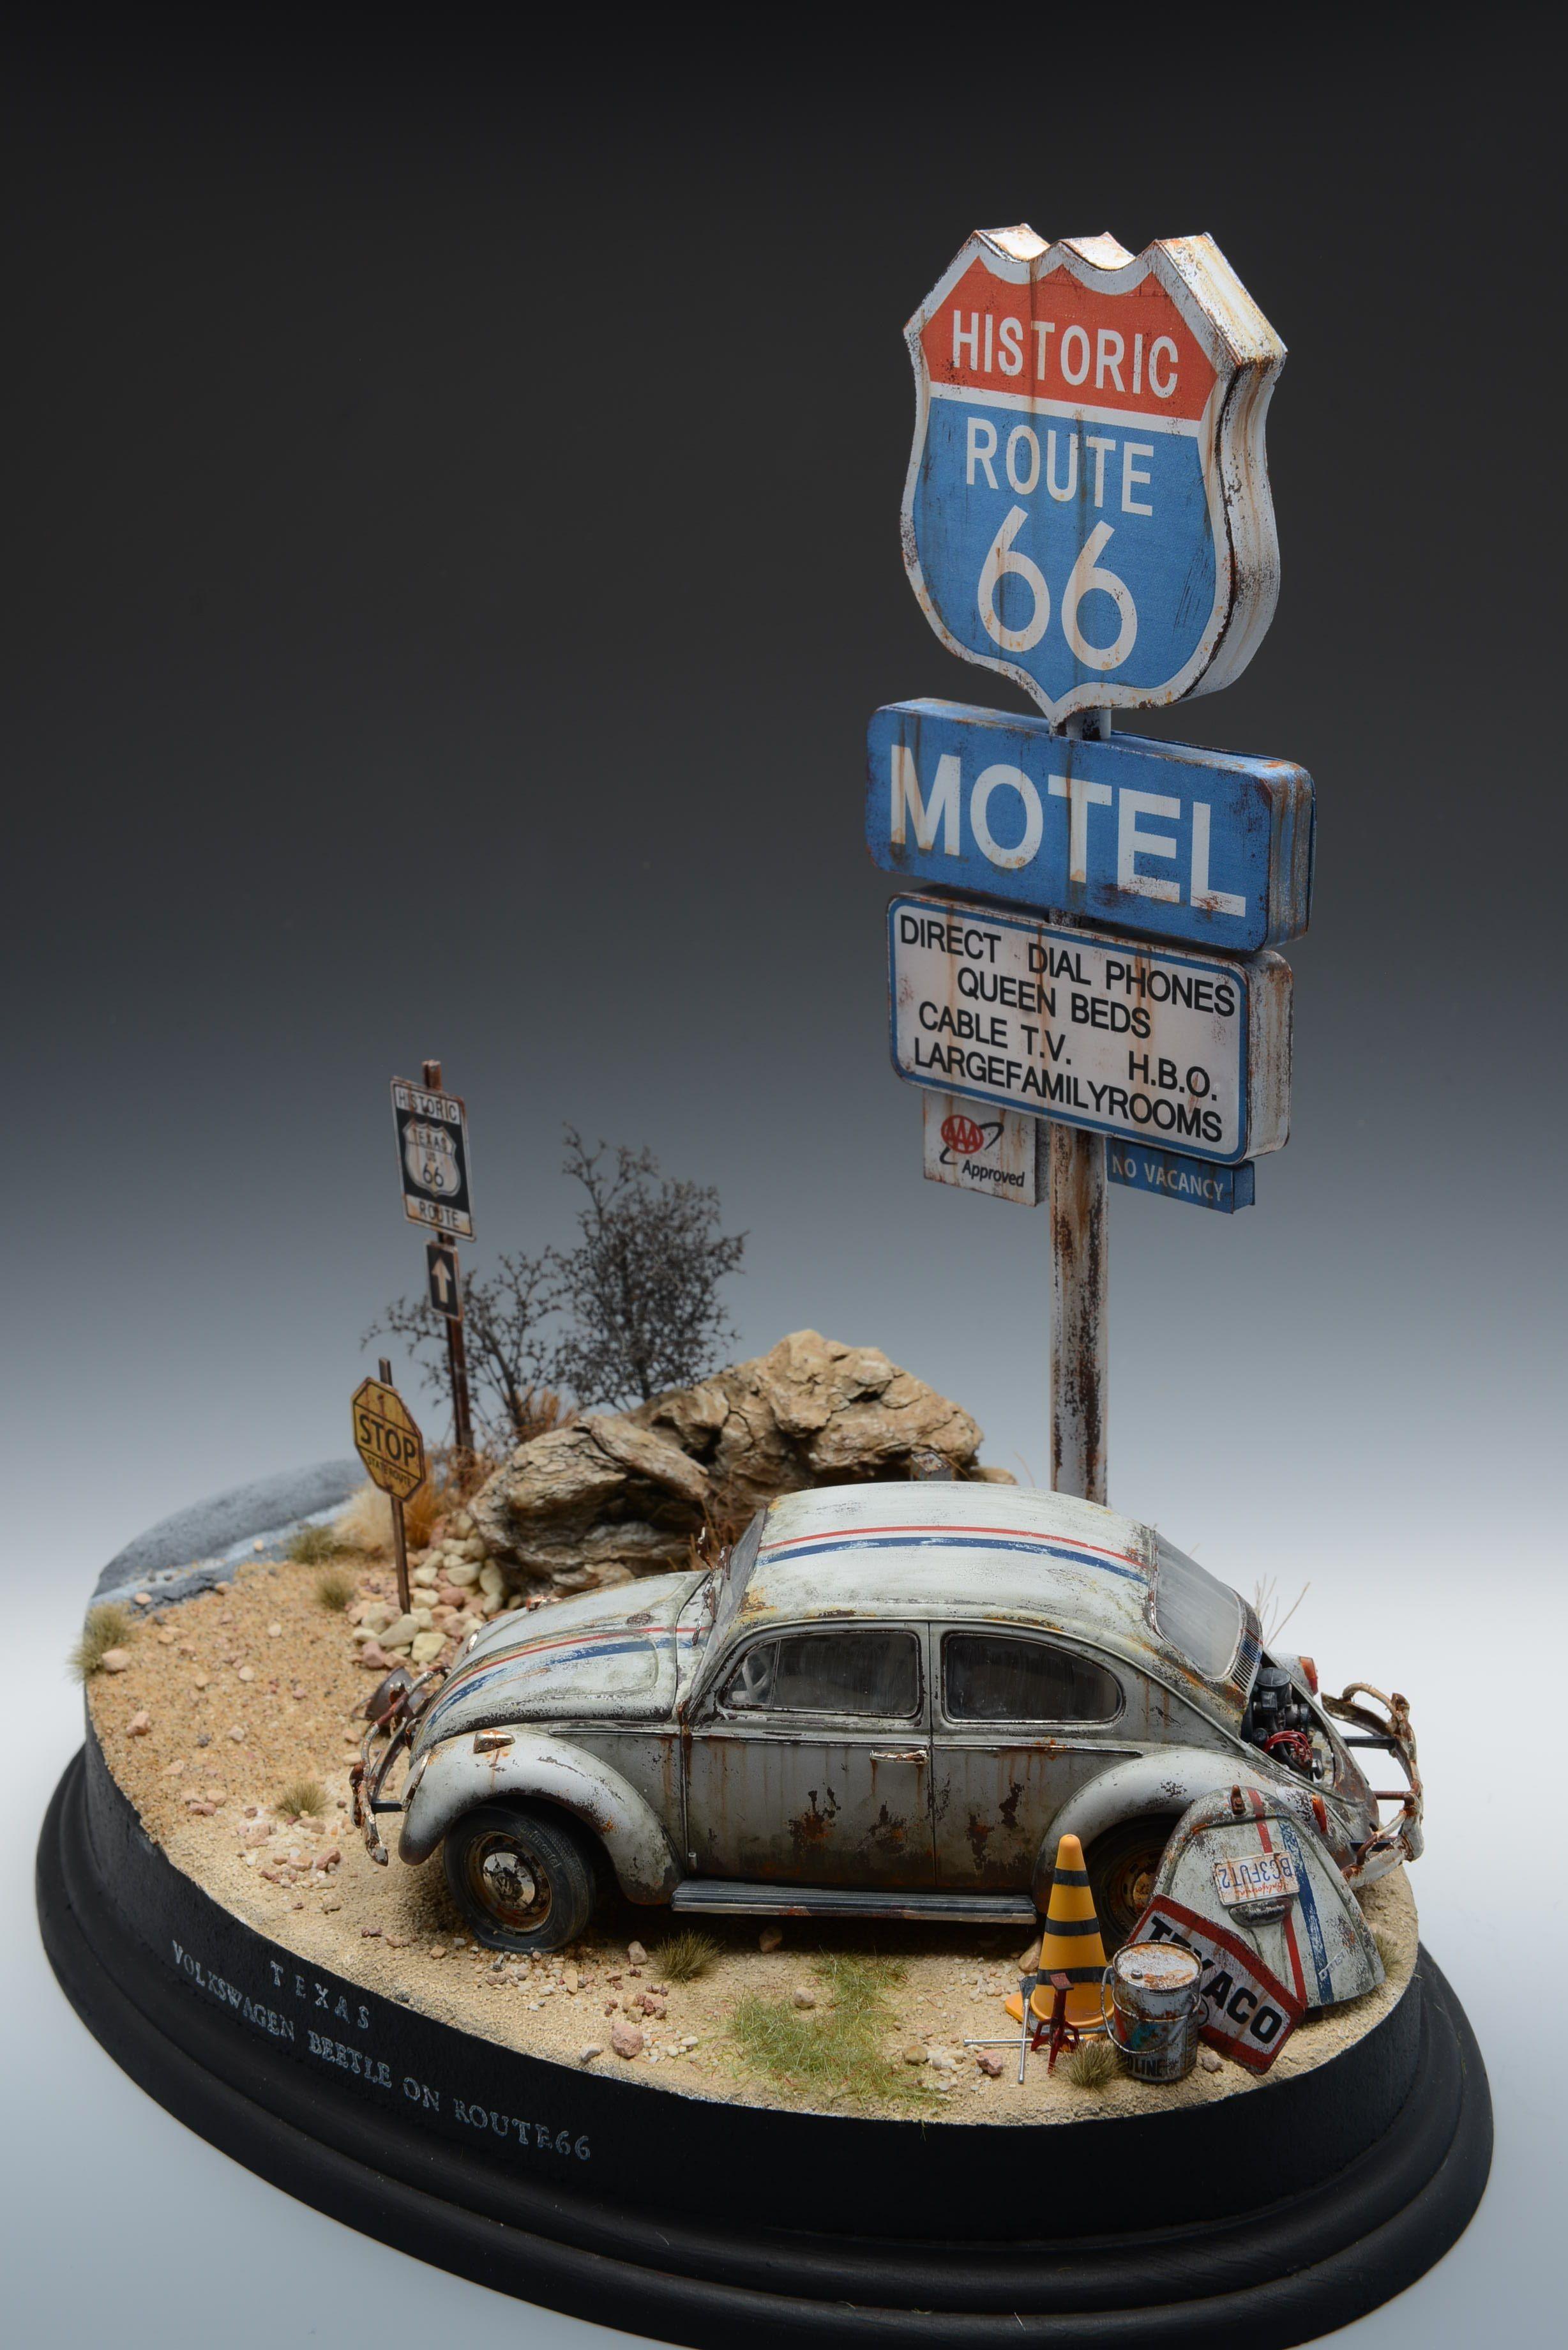 Route 66 Motel & VW Type 1 1/35 Scale Model Diorama | Diorama